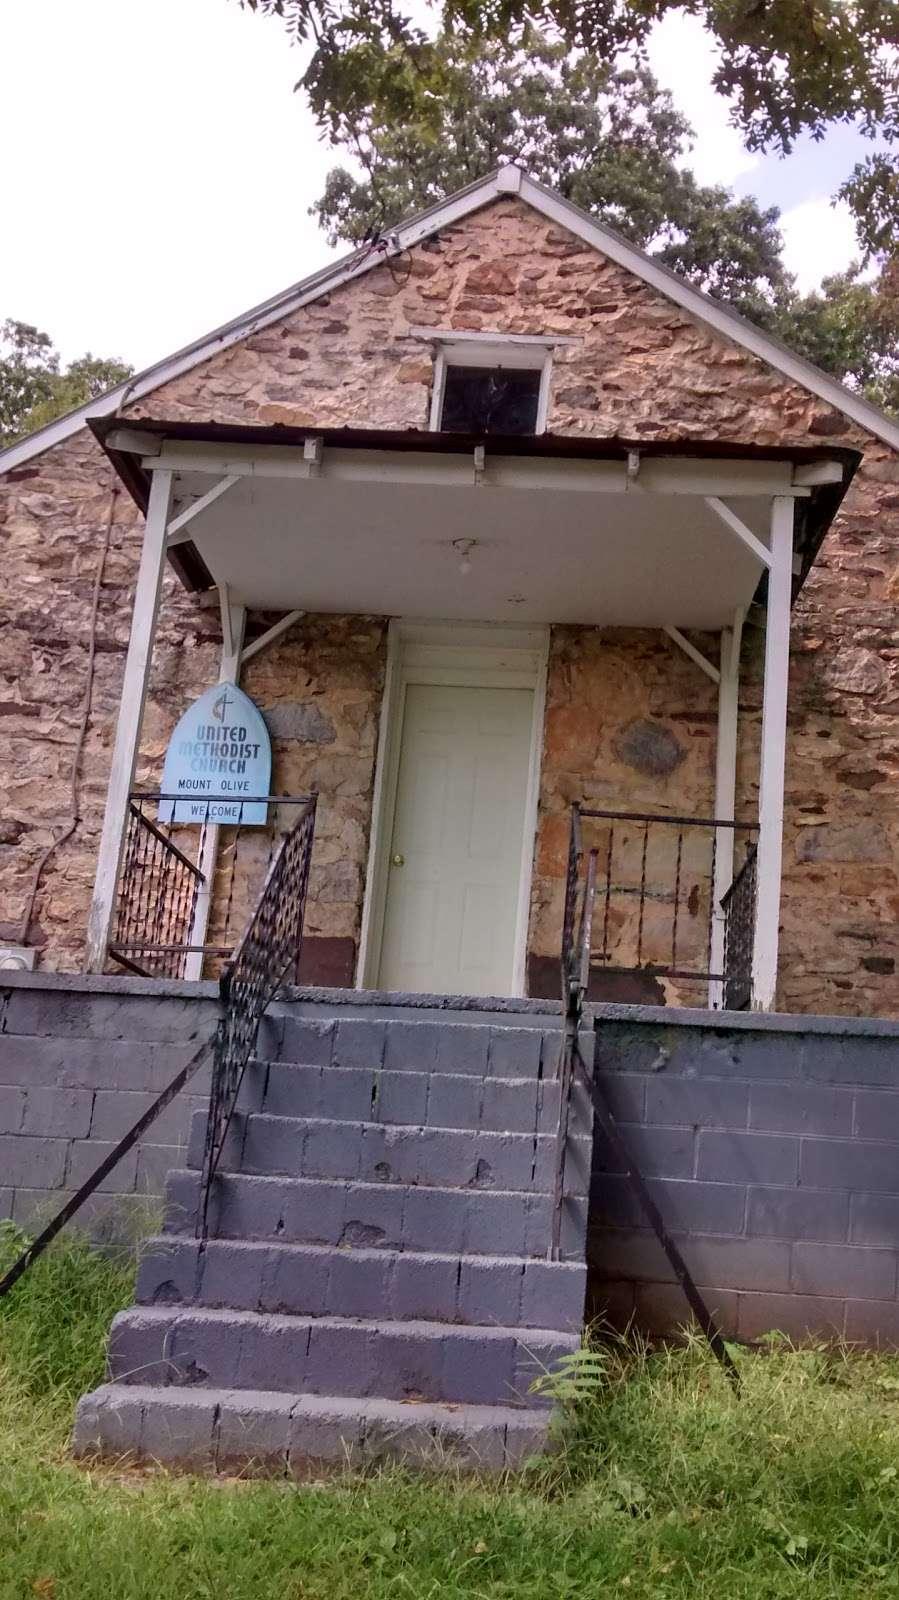 Mount Olive Church - church  | Photo 2 of 4 | Address: Gerrardstown, WV 25420, USA